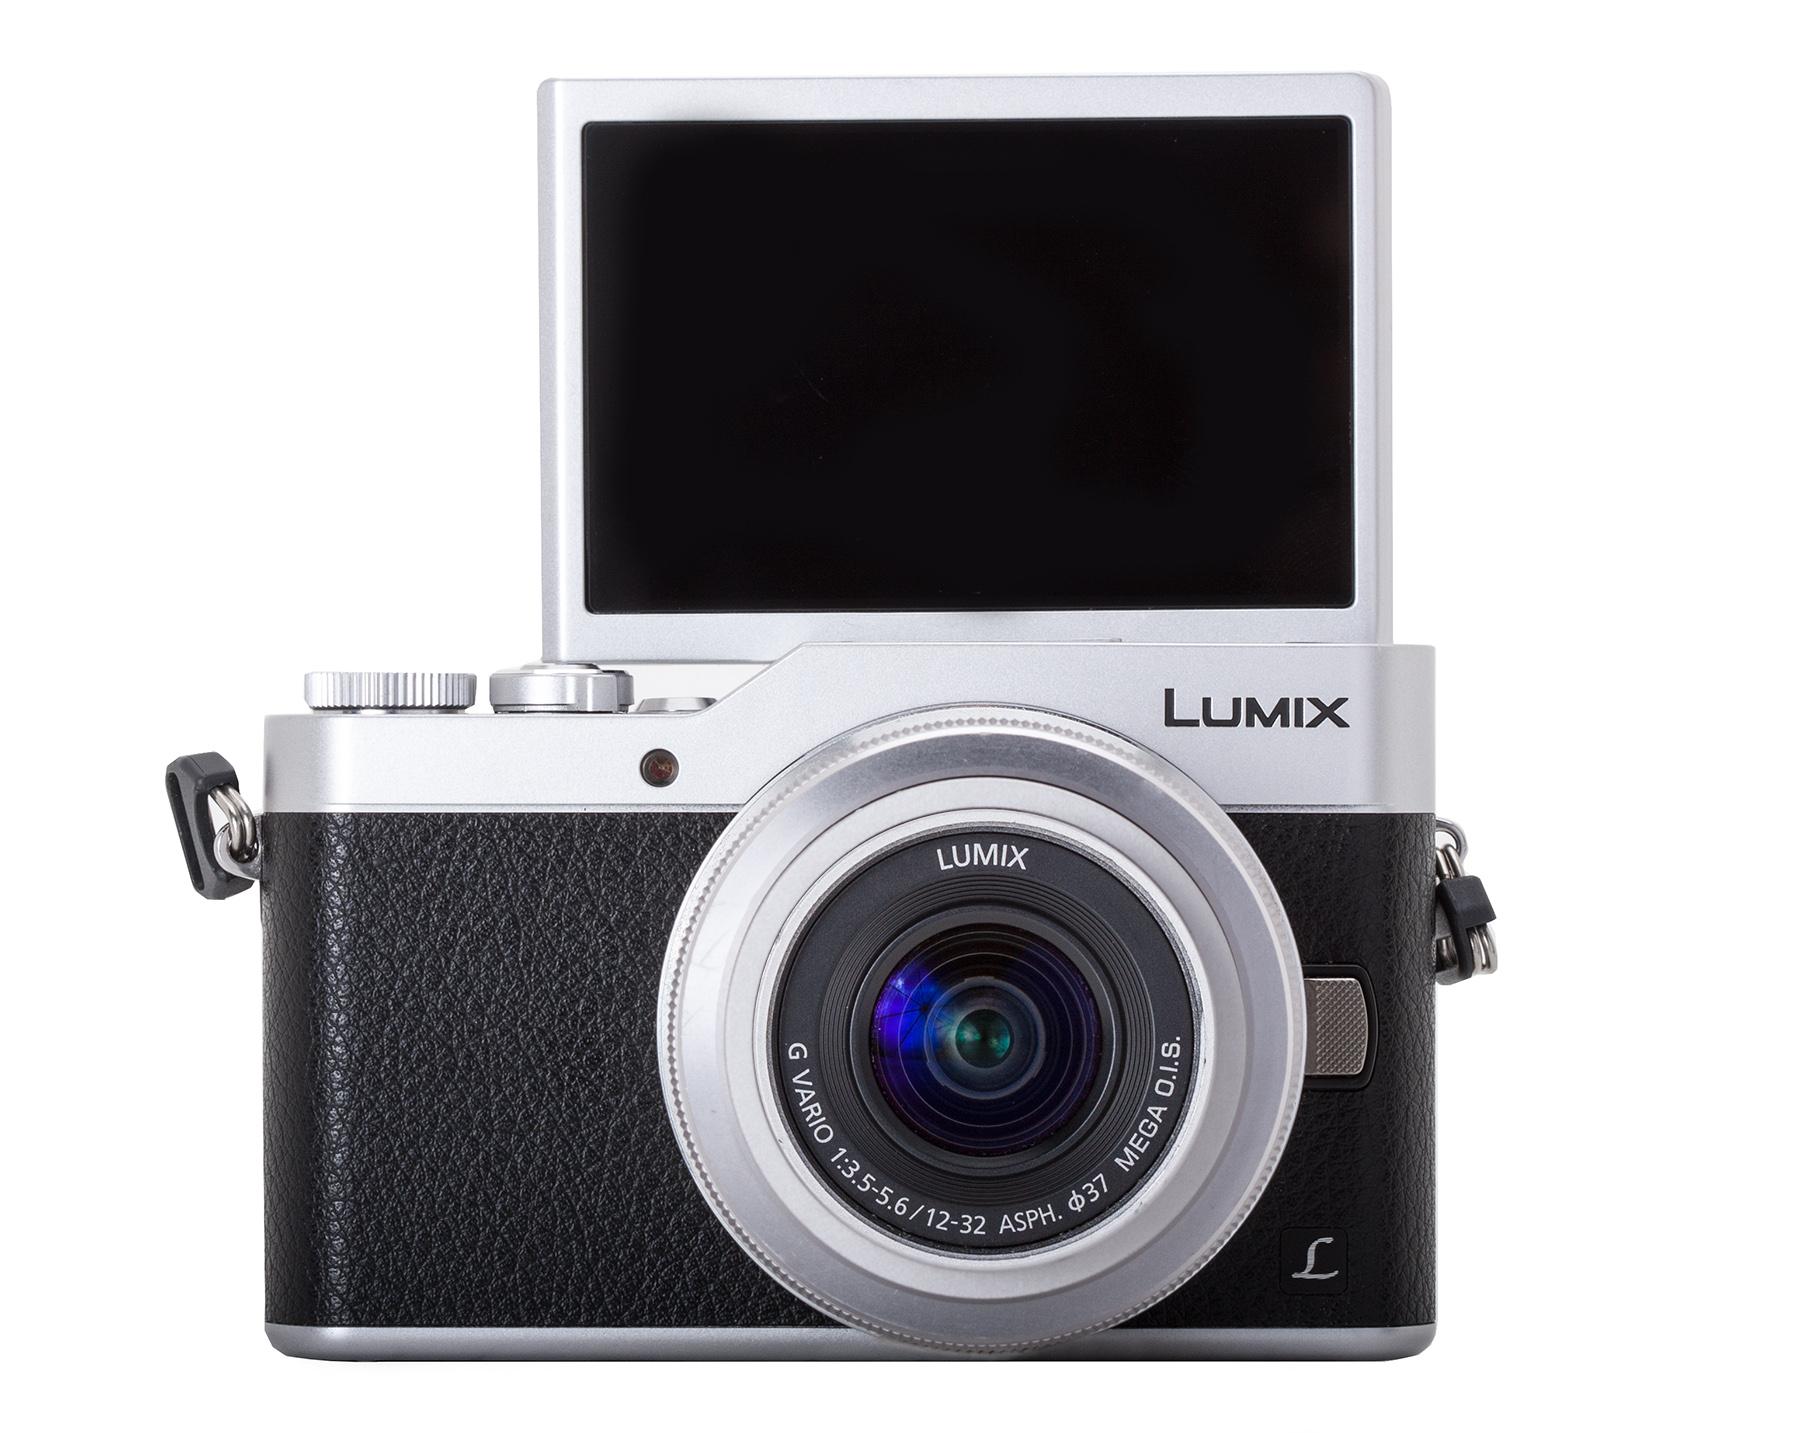 Panasonic-Lumix-DMC-GX850-Review-1 Panasonic Lumix DMC-GX850 Review News and Reviews